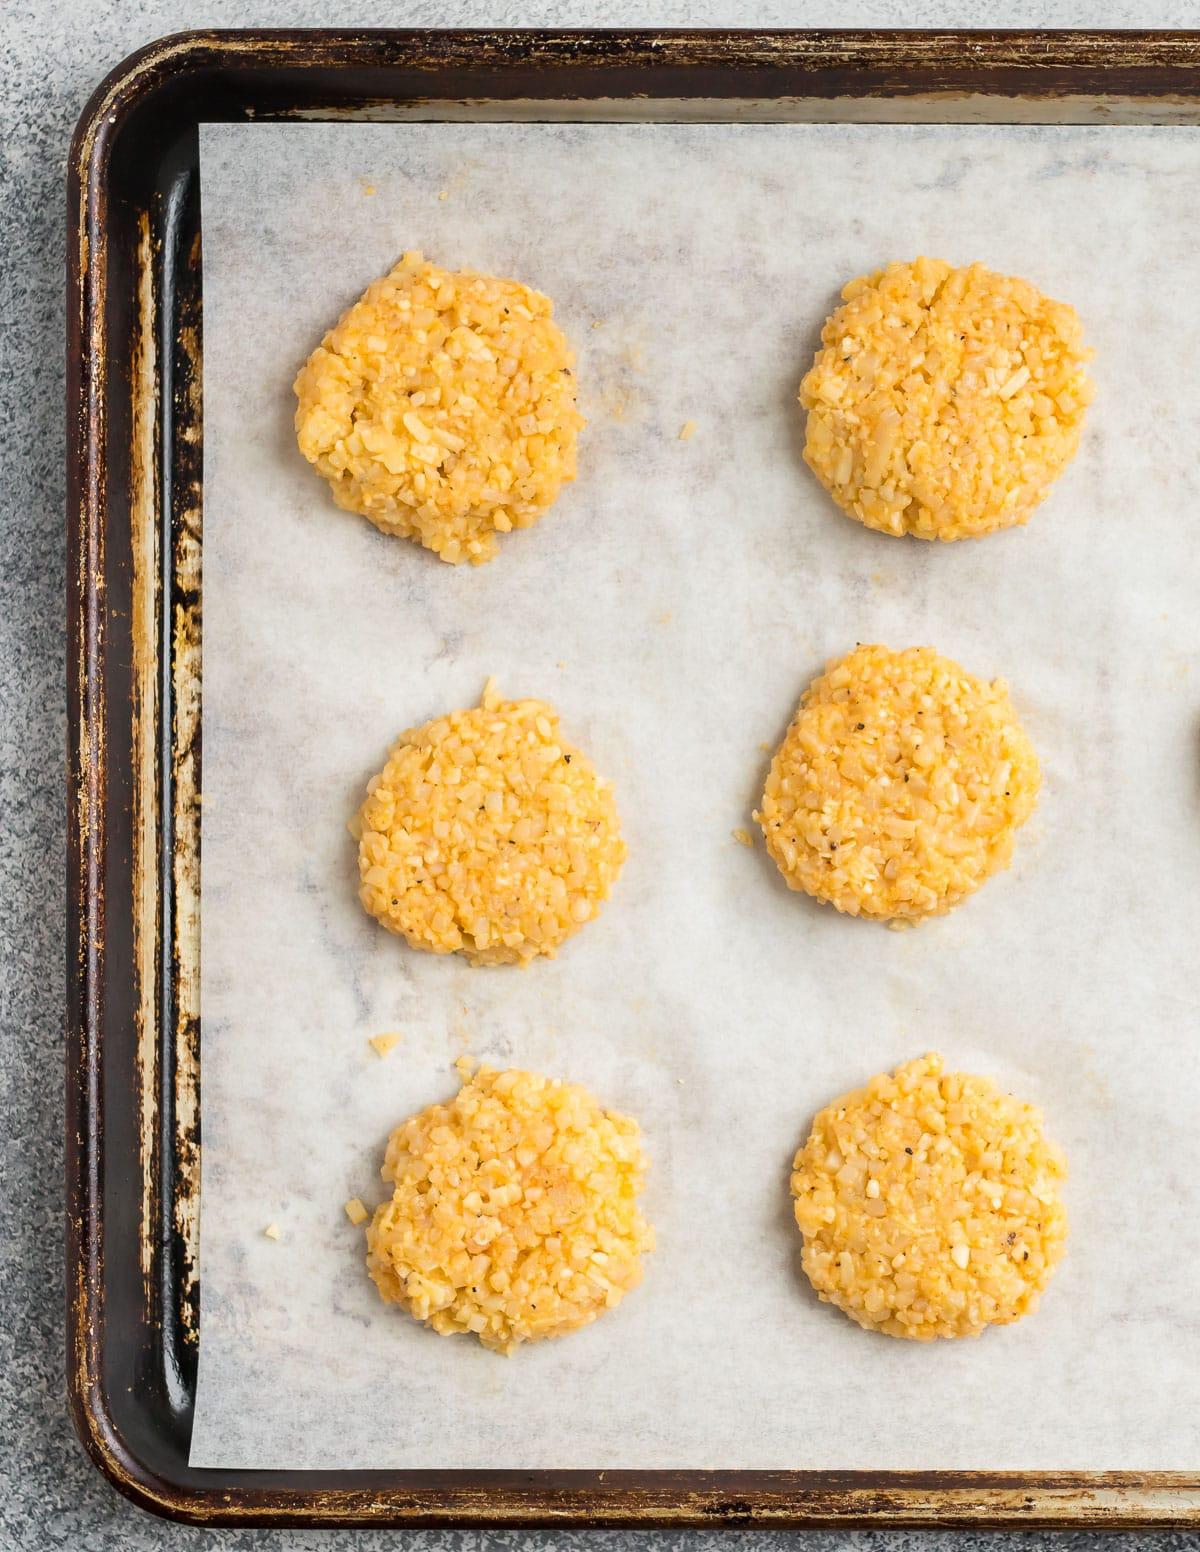 Vegetable patties on a baking sheet